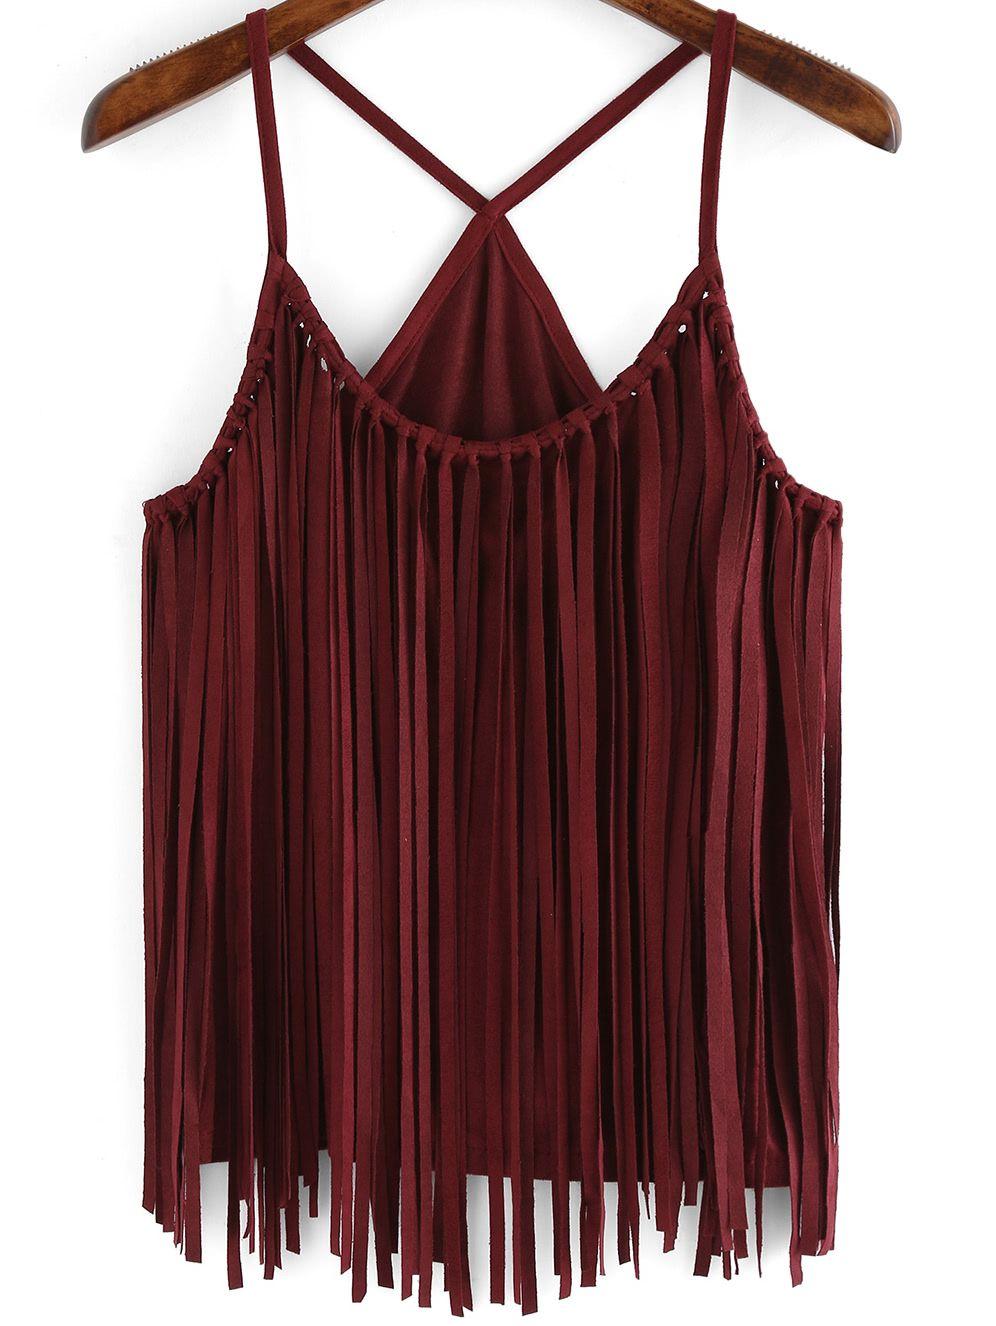 TOPUNDER Fashion Womens Ruffles Tank Top Vest Off Shoulder T-Shirt Halter Blouse Camis